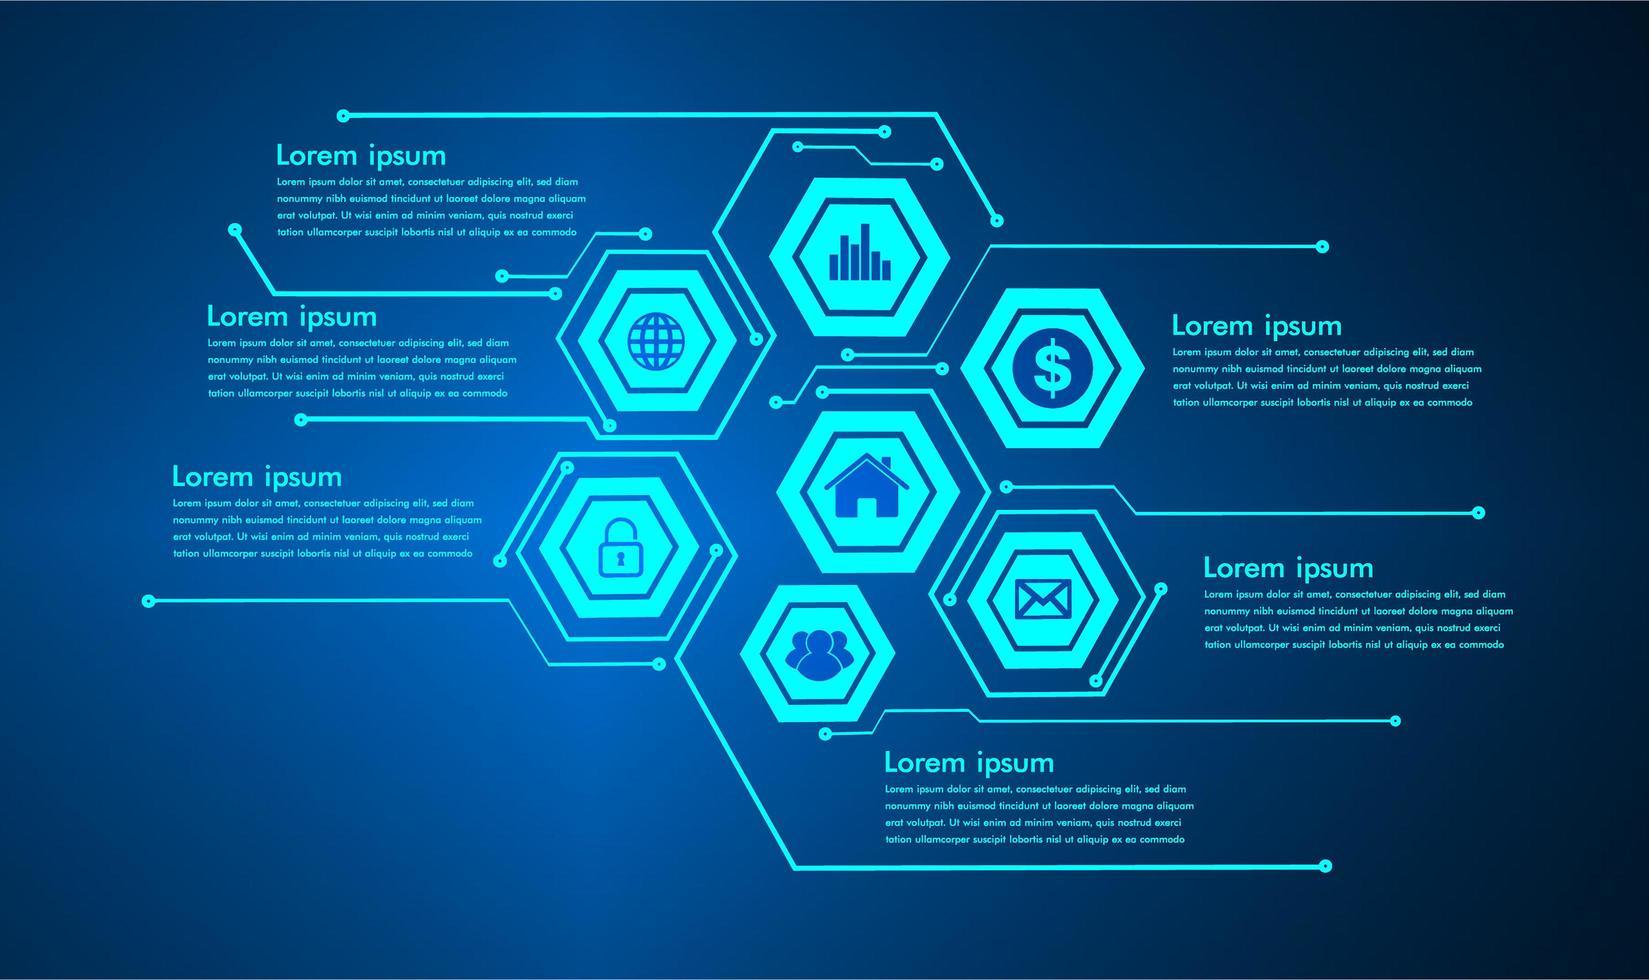 tekstvak infographic, internet of things cybertechnologie vector